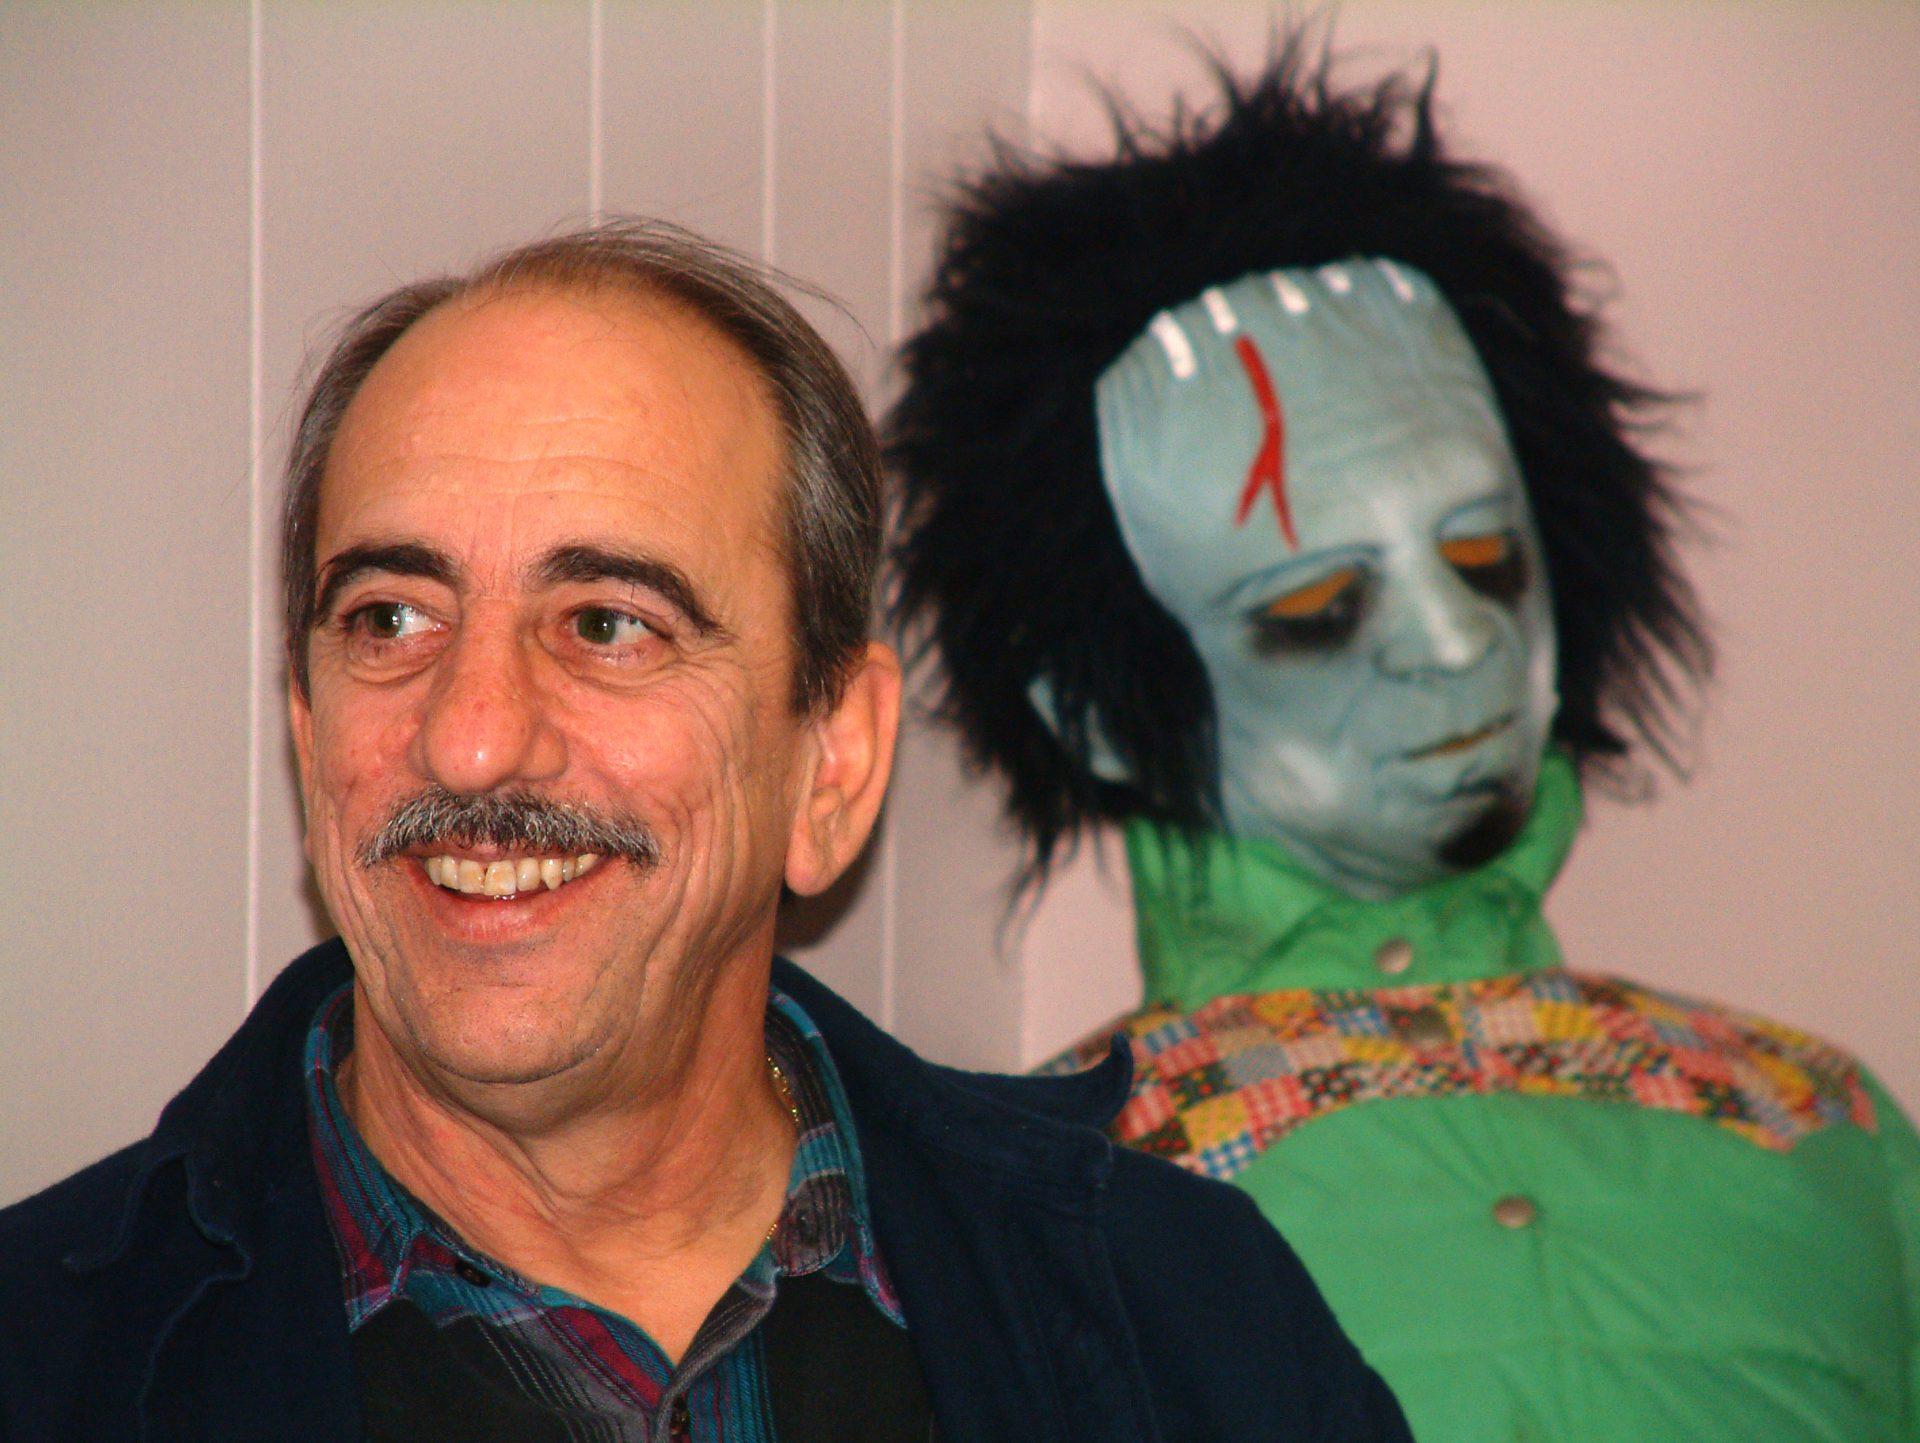 Enjoying a Will & Baumer Halloween party 2002